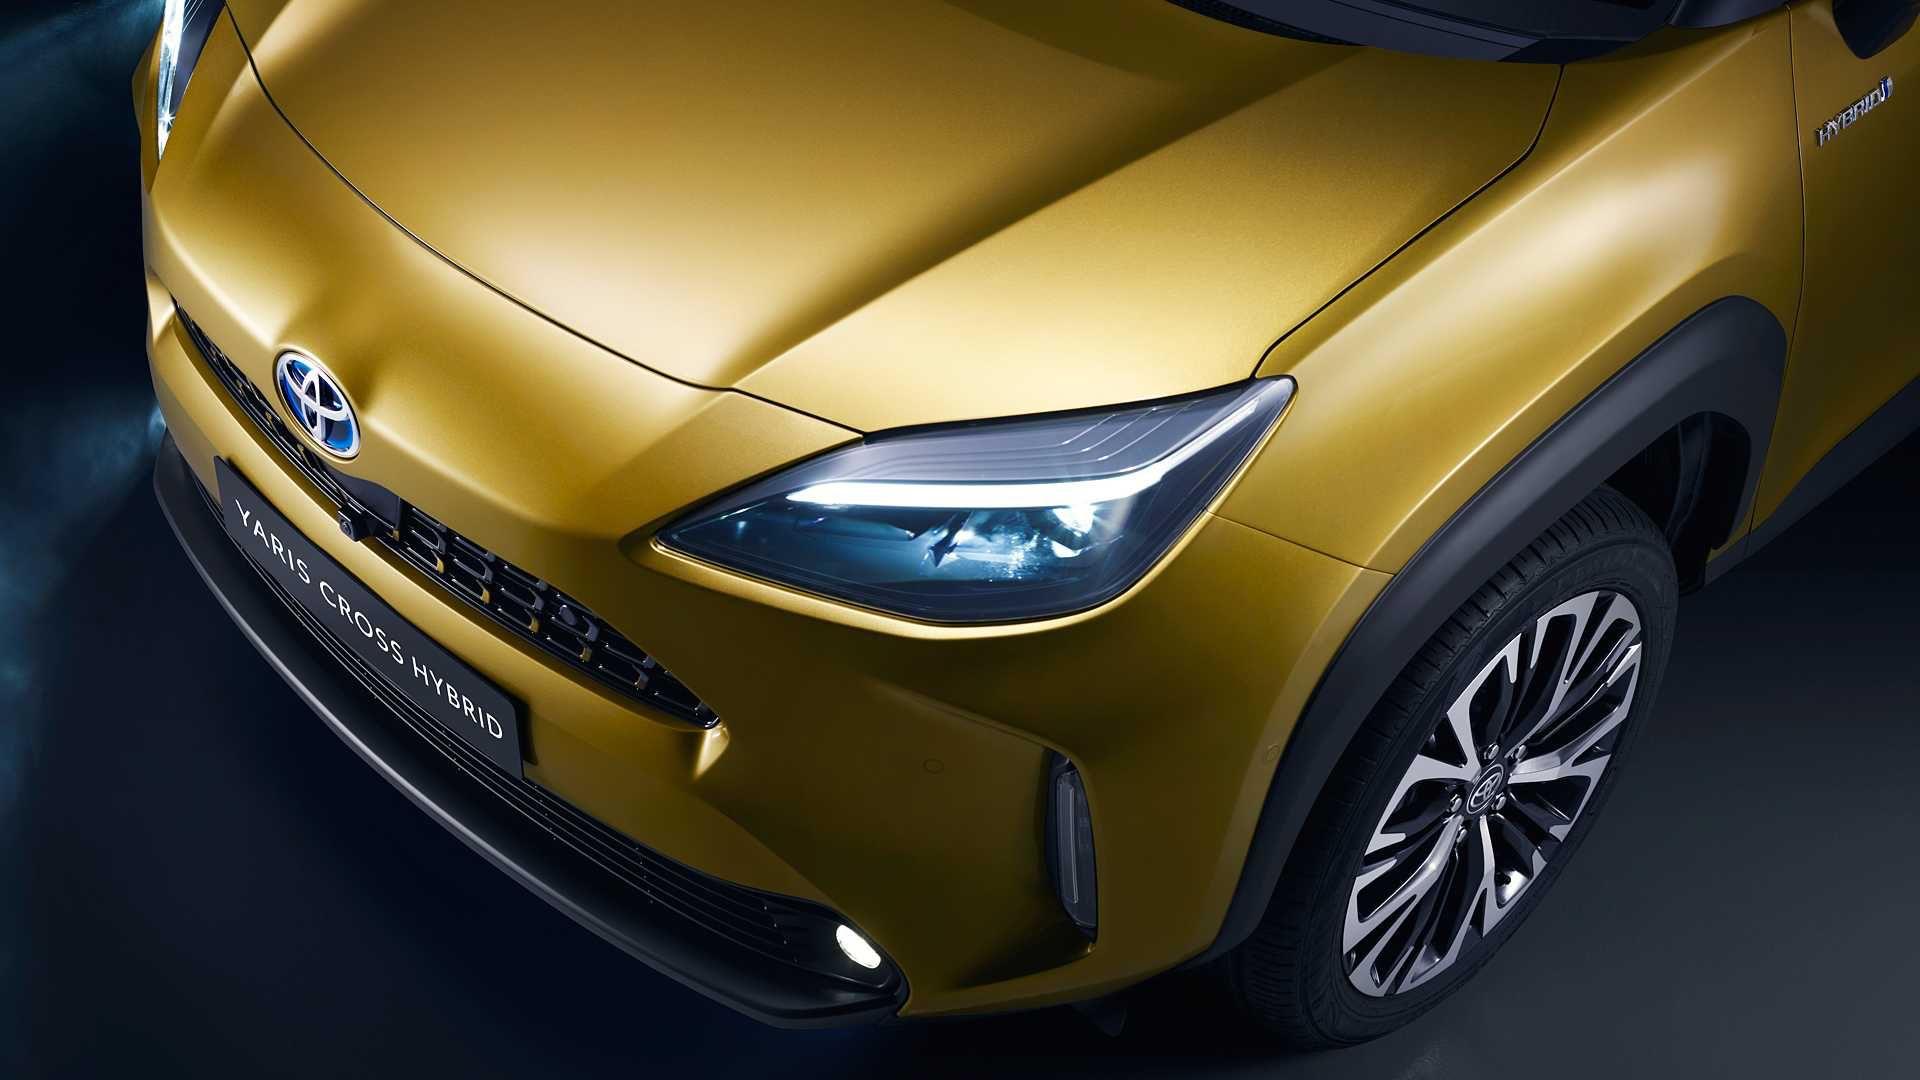 Fari Led della Toyota Yaris Cross 2021